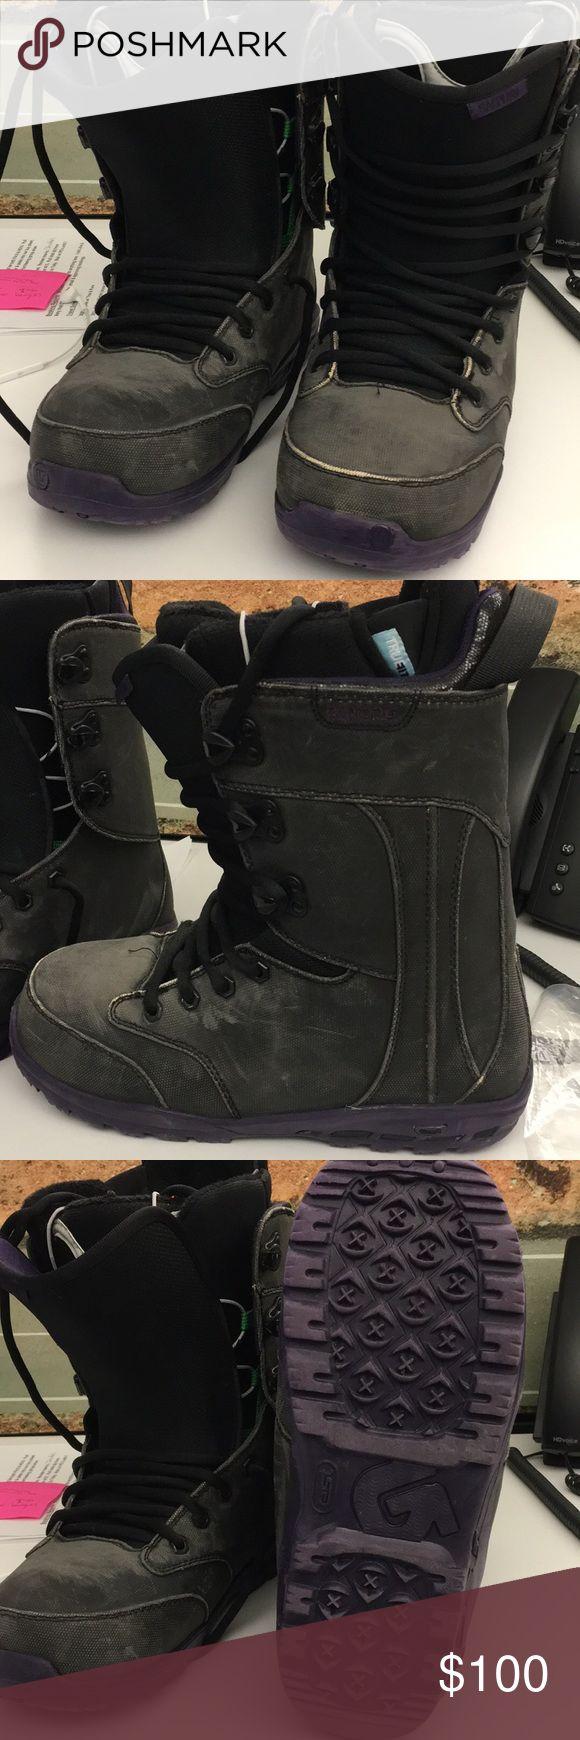 new product 7bcfd dcbb9 ... adidas Originals x Burton Snowboards 2010 FallWinter Capsule Collection  Burton snowboards, Snowboards and Adidas ...